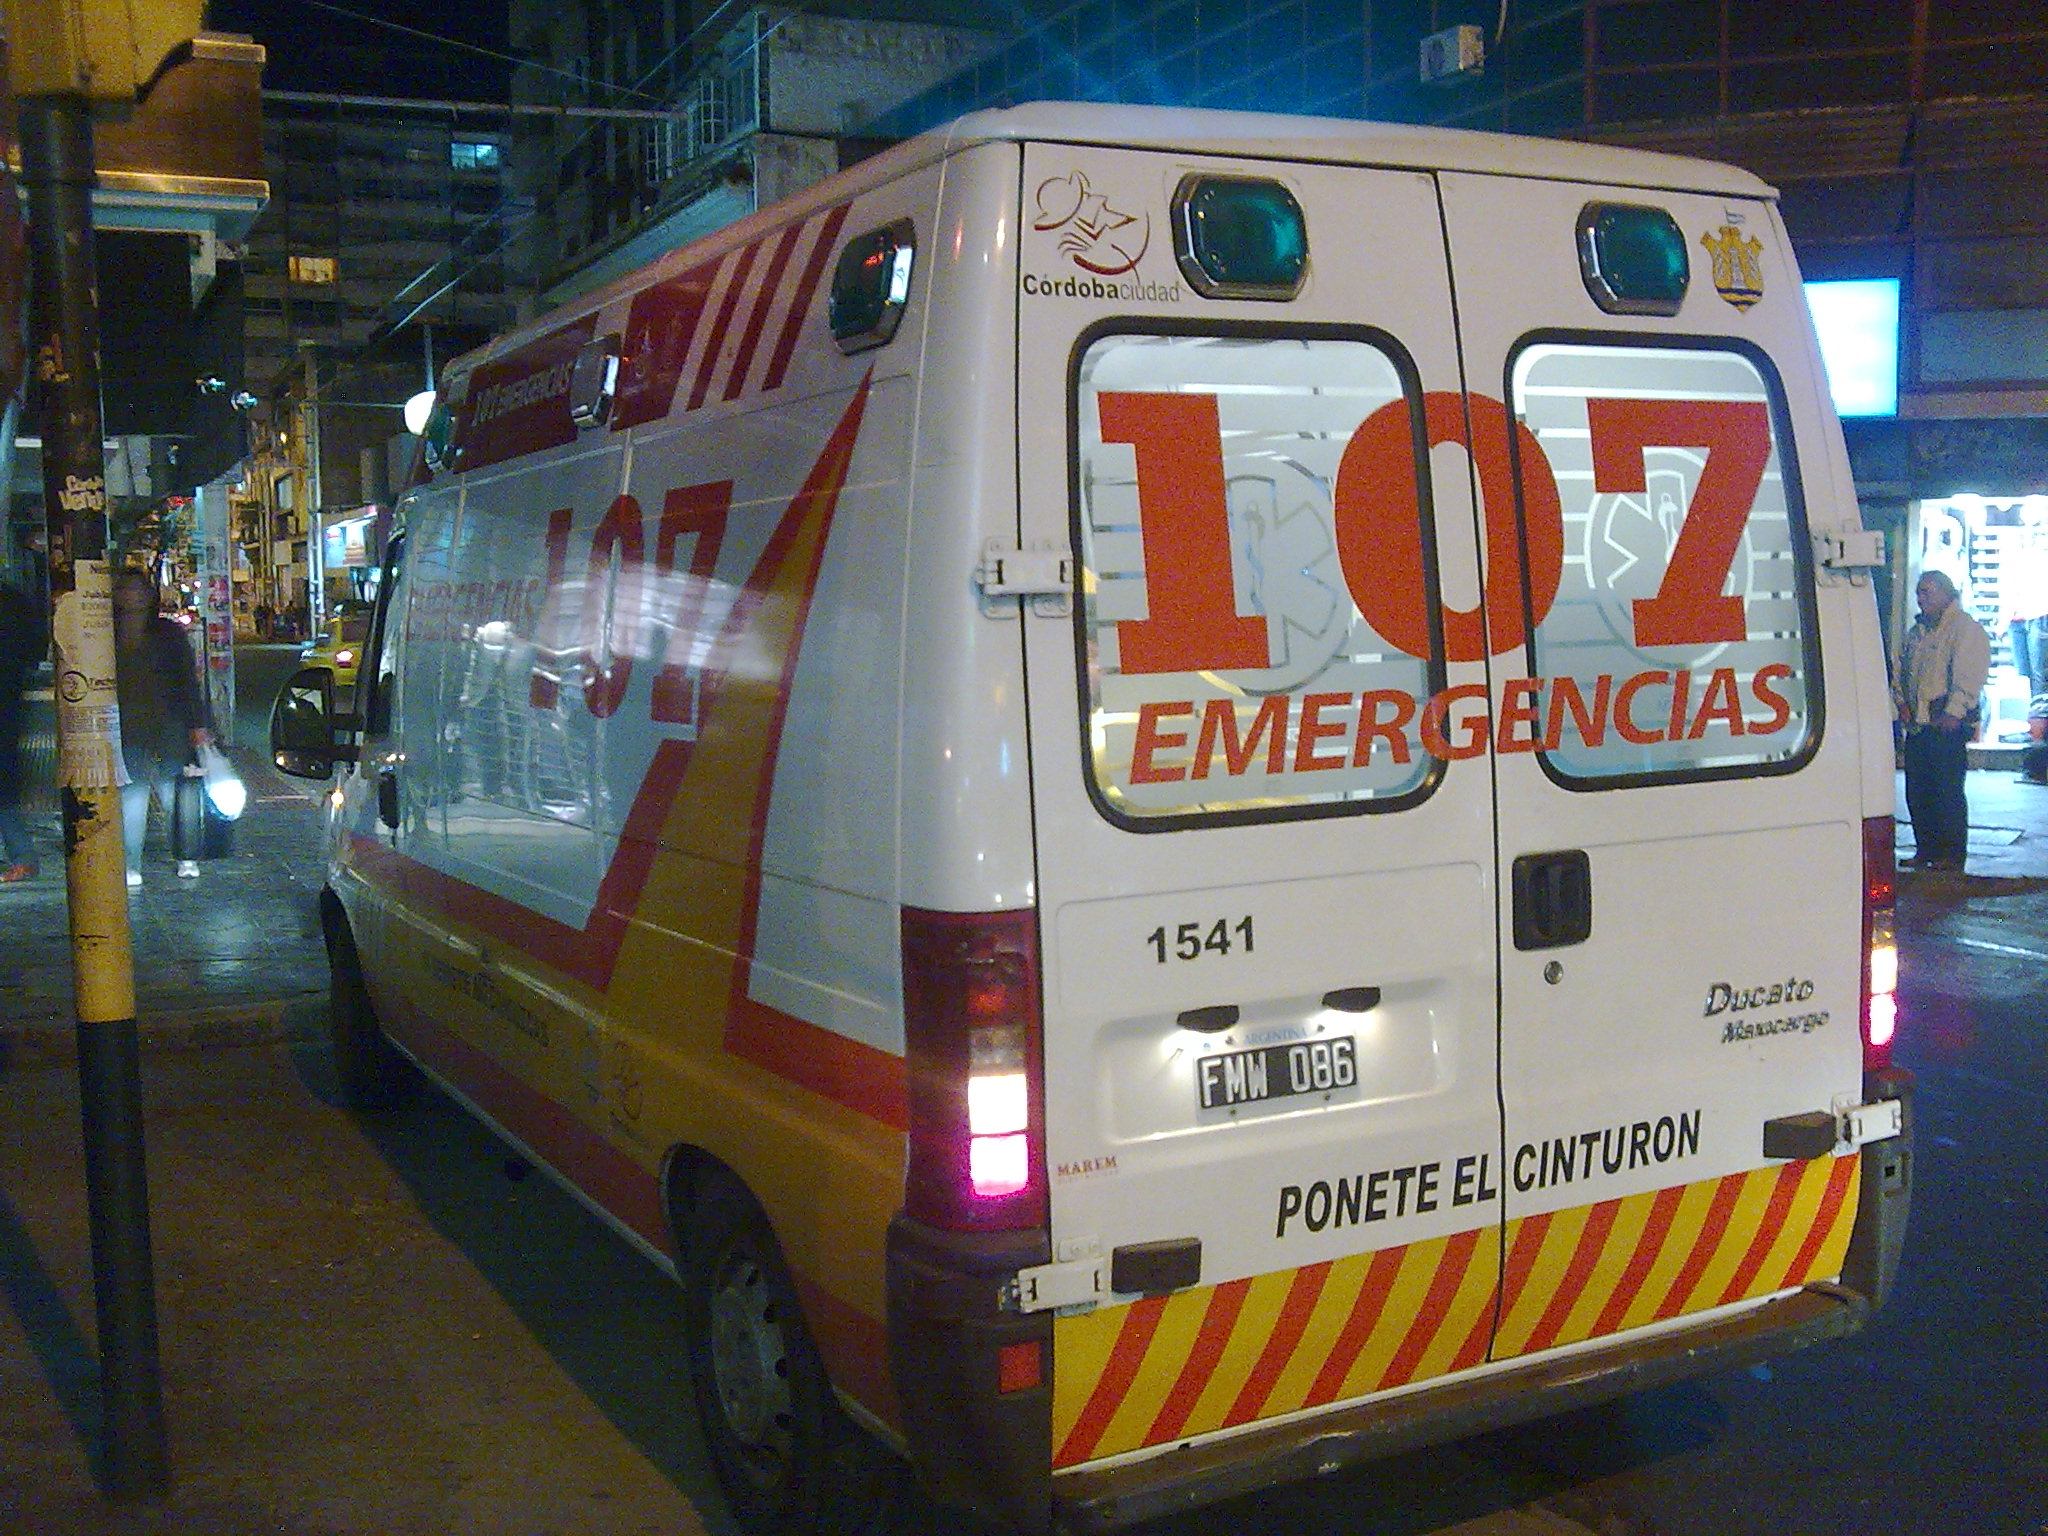 [GAME] Count with pictures - Page 3 Ambulancia_del_servicio_107_C%C3%B3rdoba_(Argentina)_2010-05-26